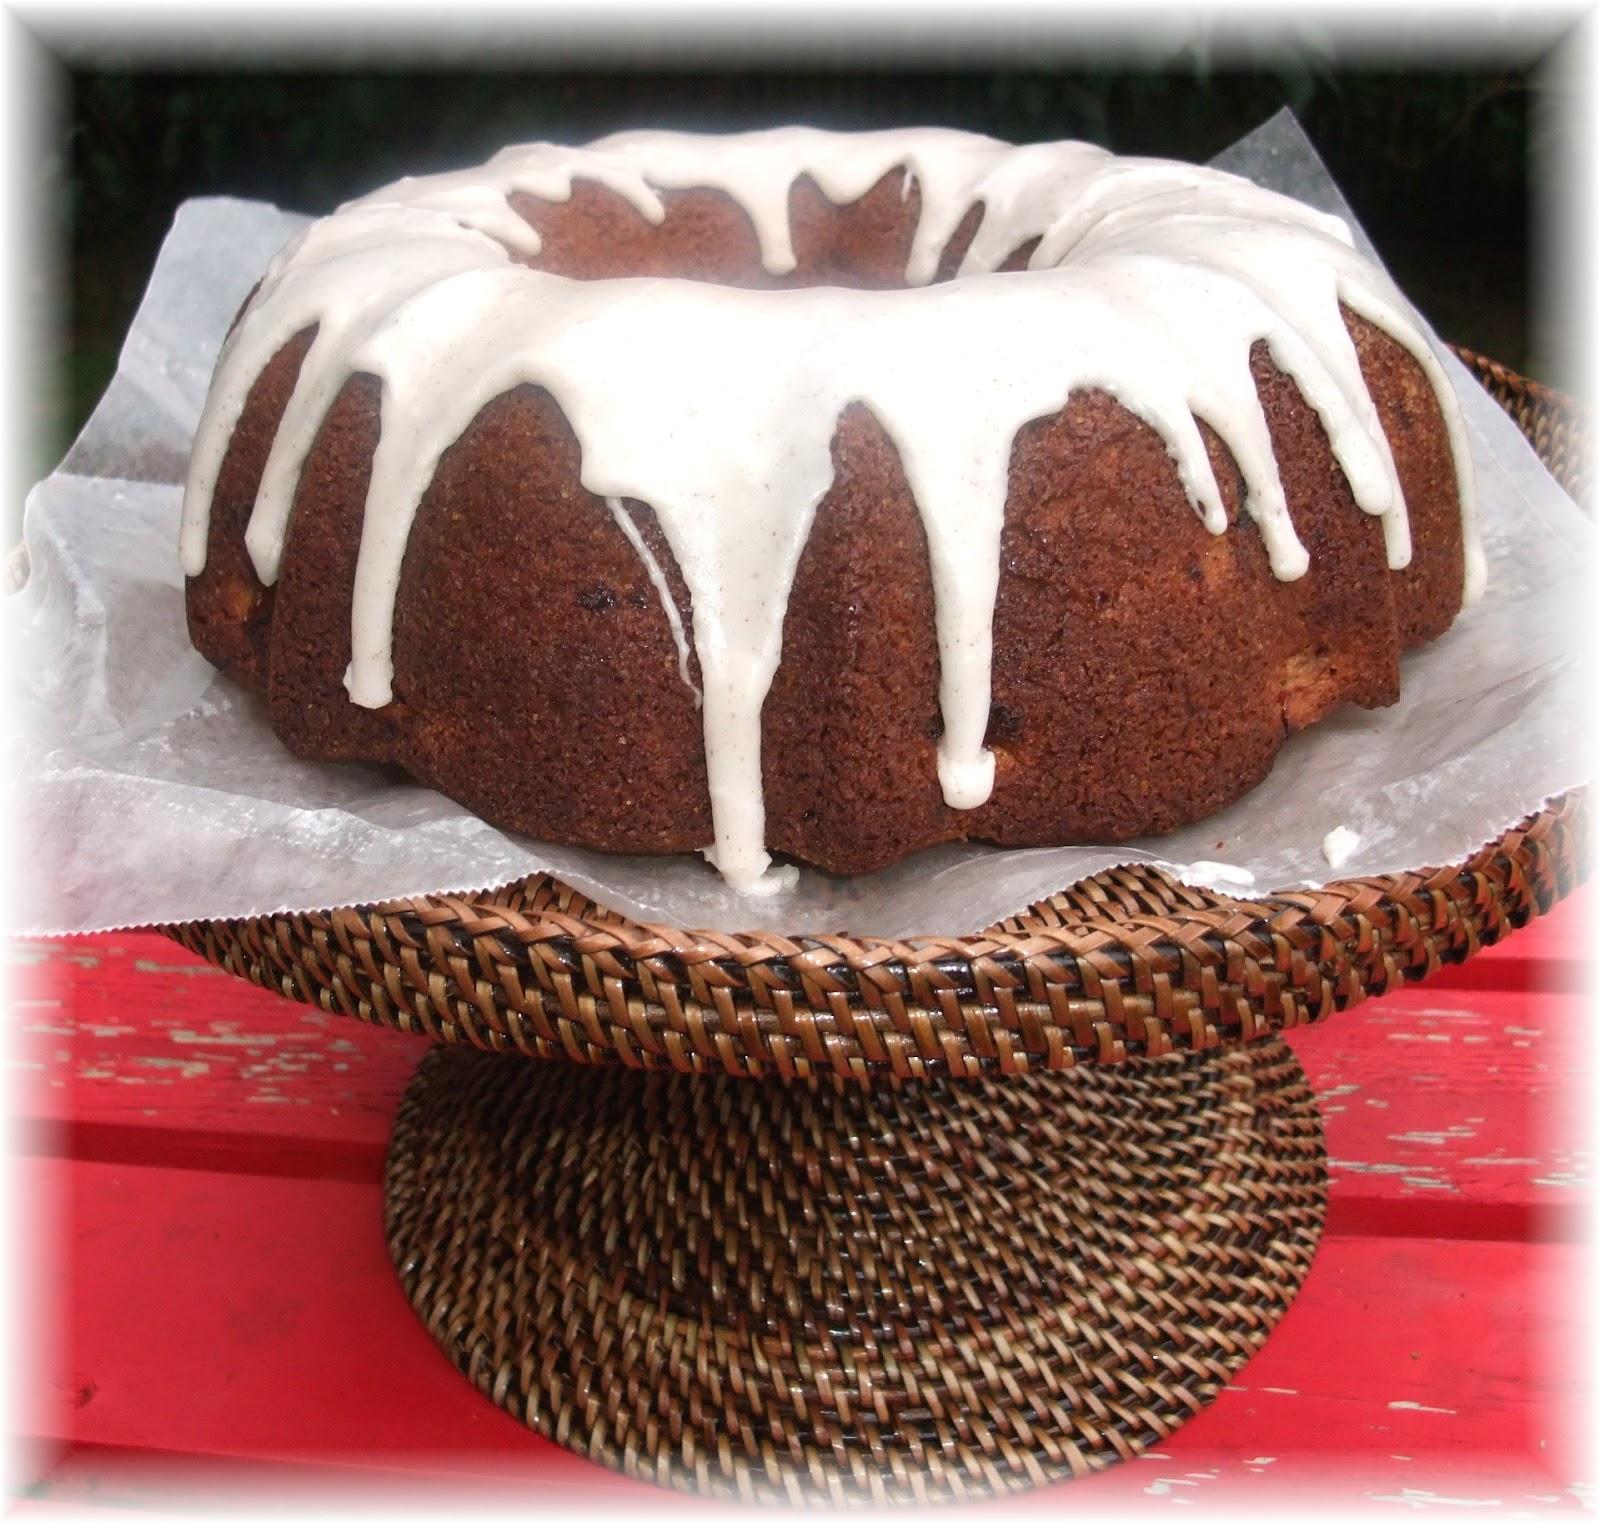 Rosie S Country Baking Fresh Apple Bundt Cake